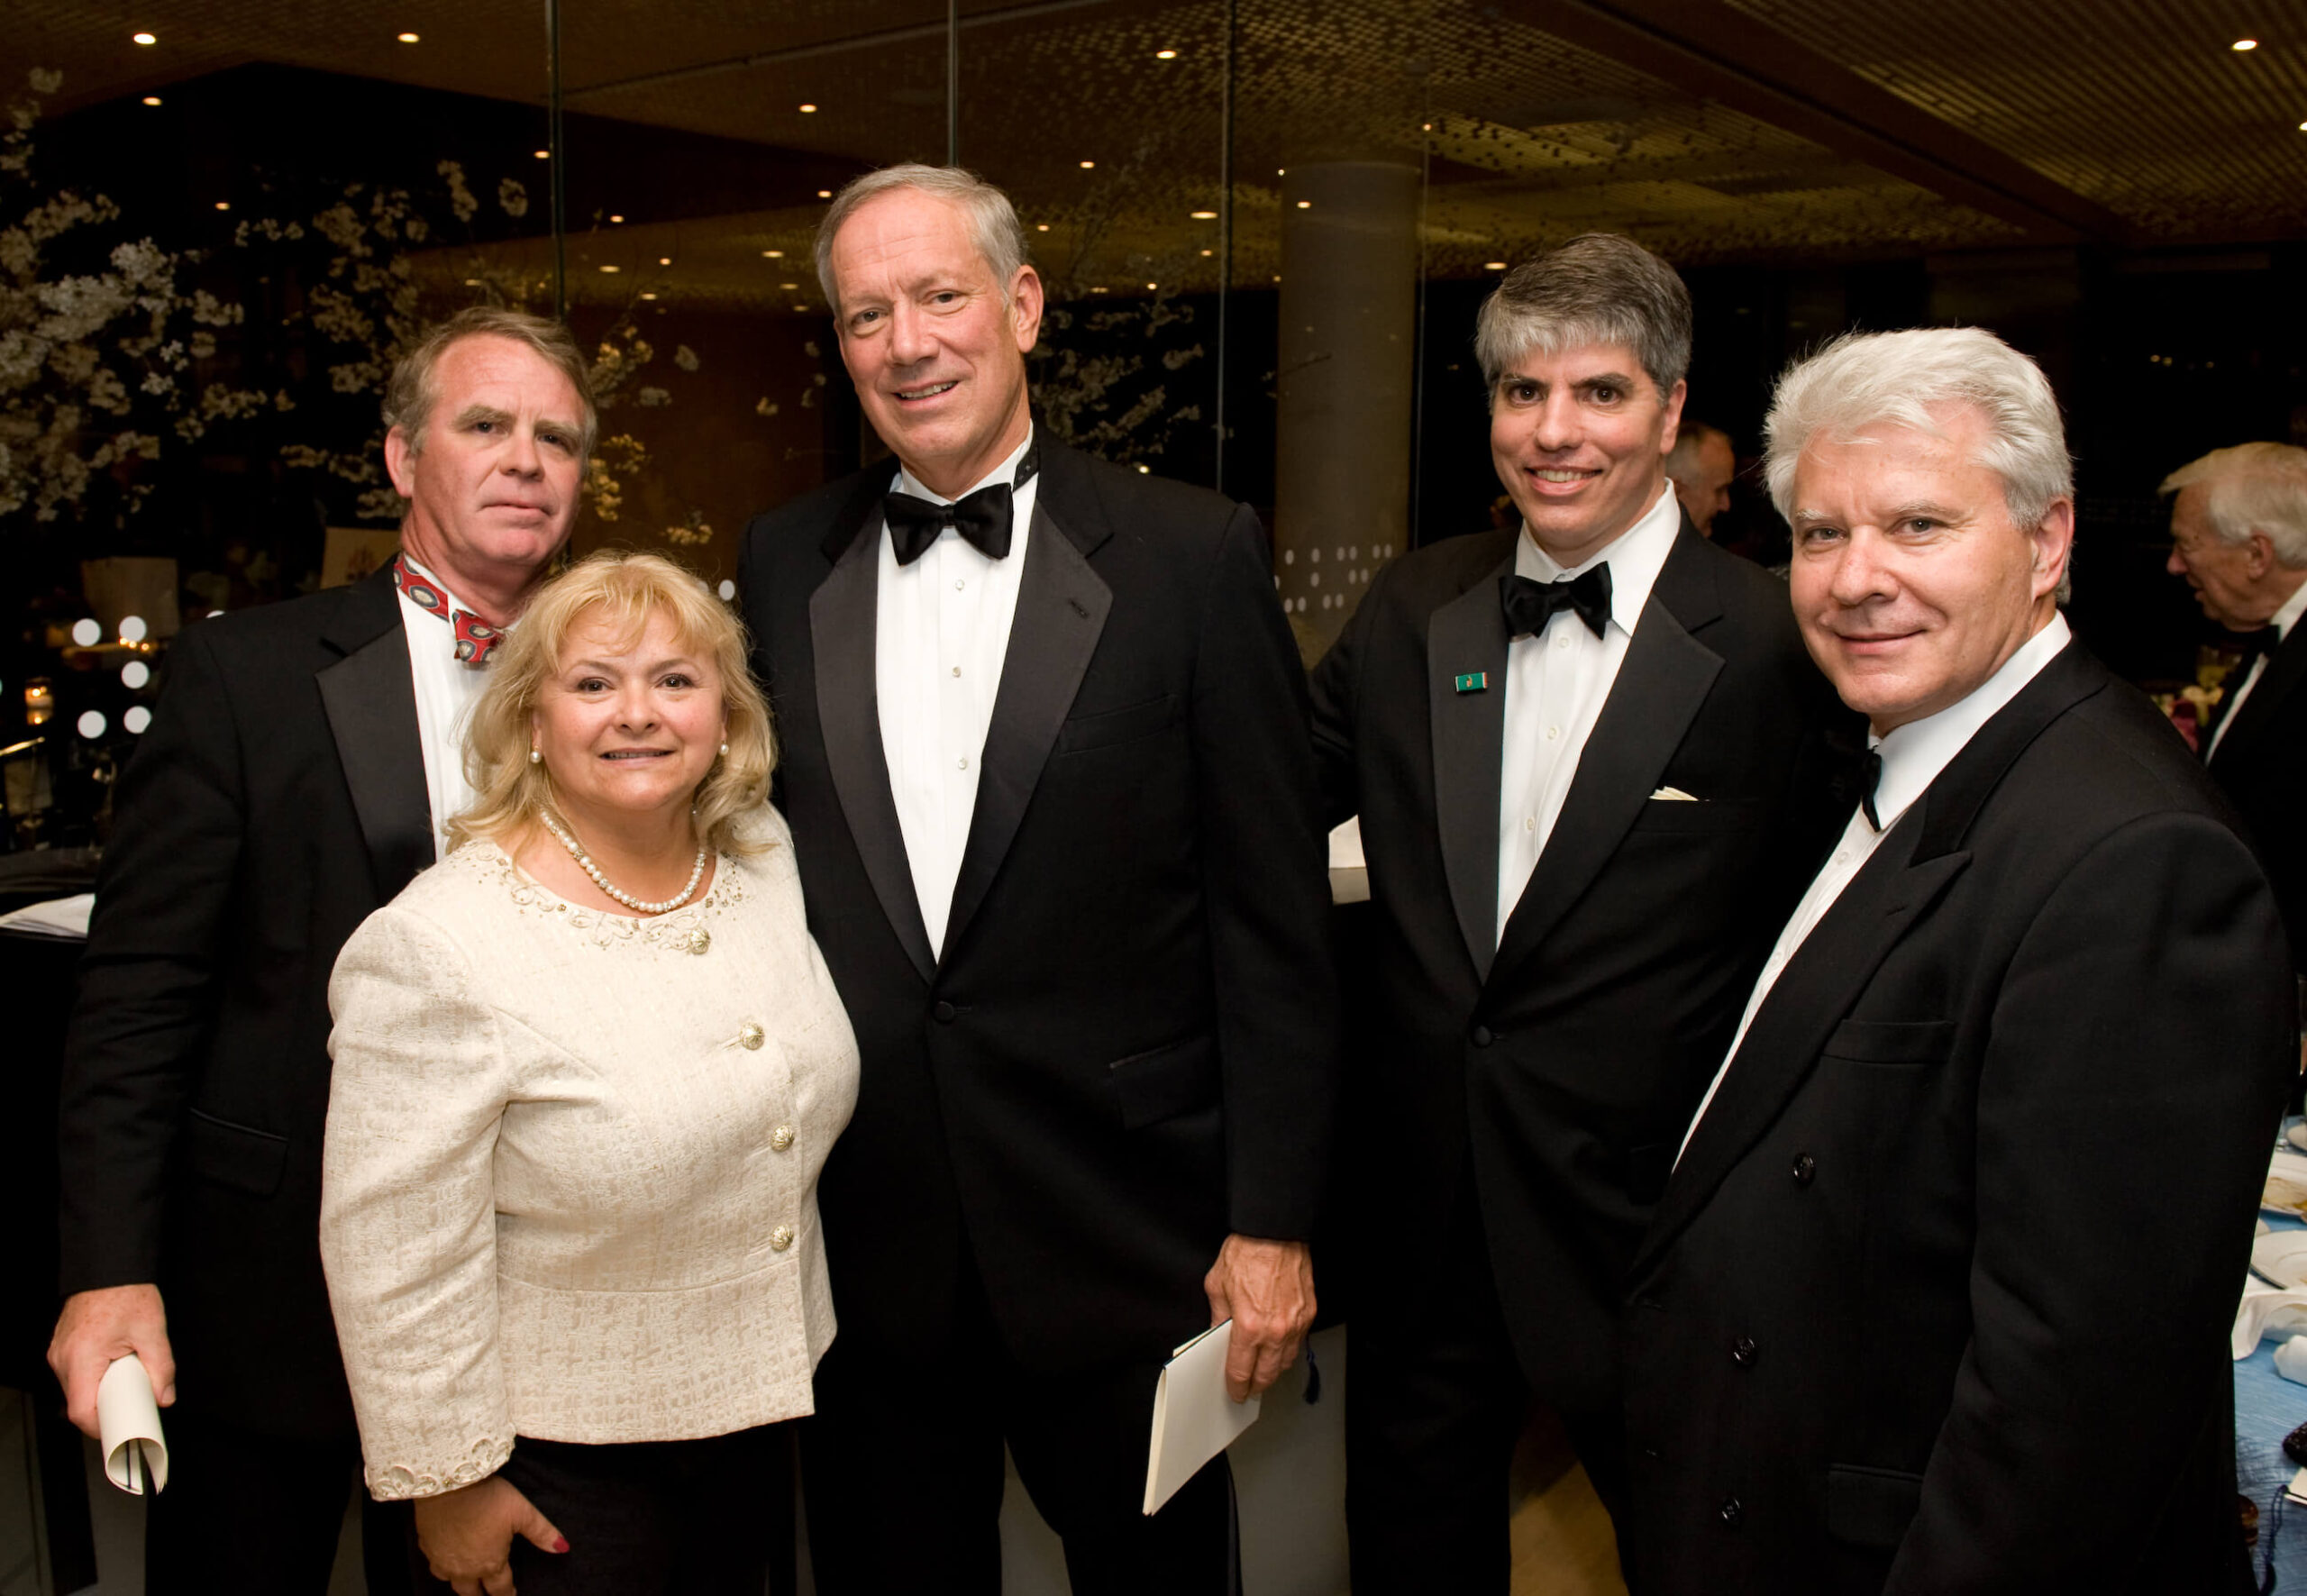 Ambassador Thomas Robertson, Mrs. Erika Fedor, Governor George Pataki, Mr. Maximilian N. Teleki, Mr. Stefan Fedor